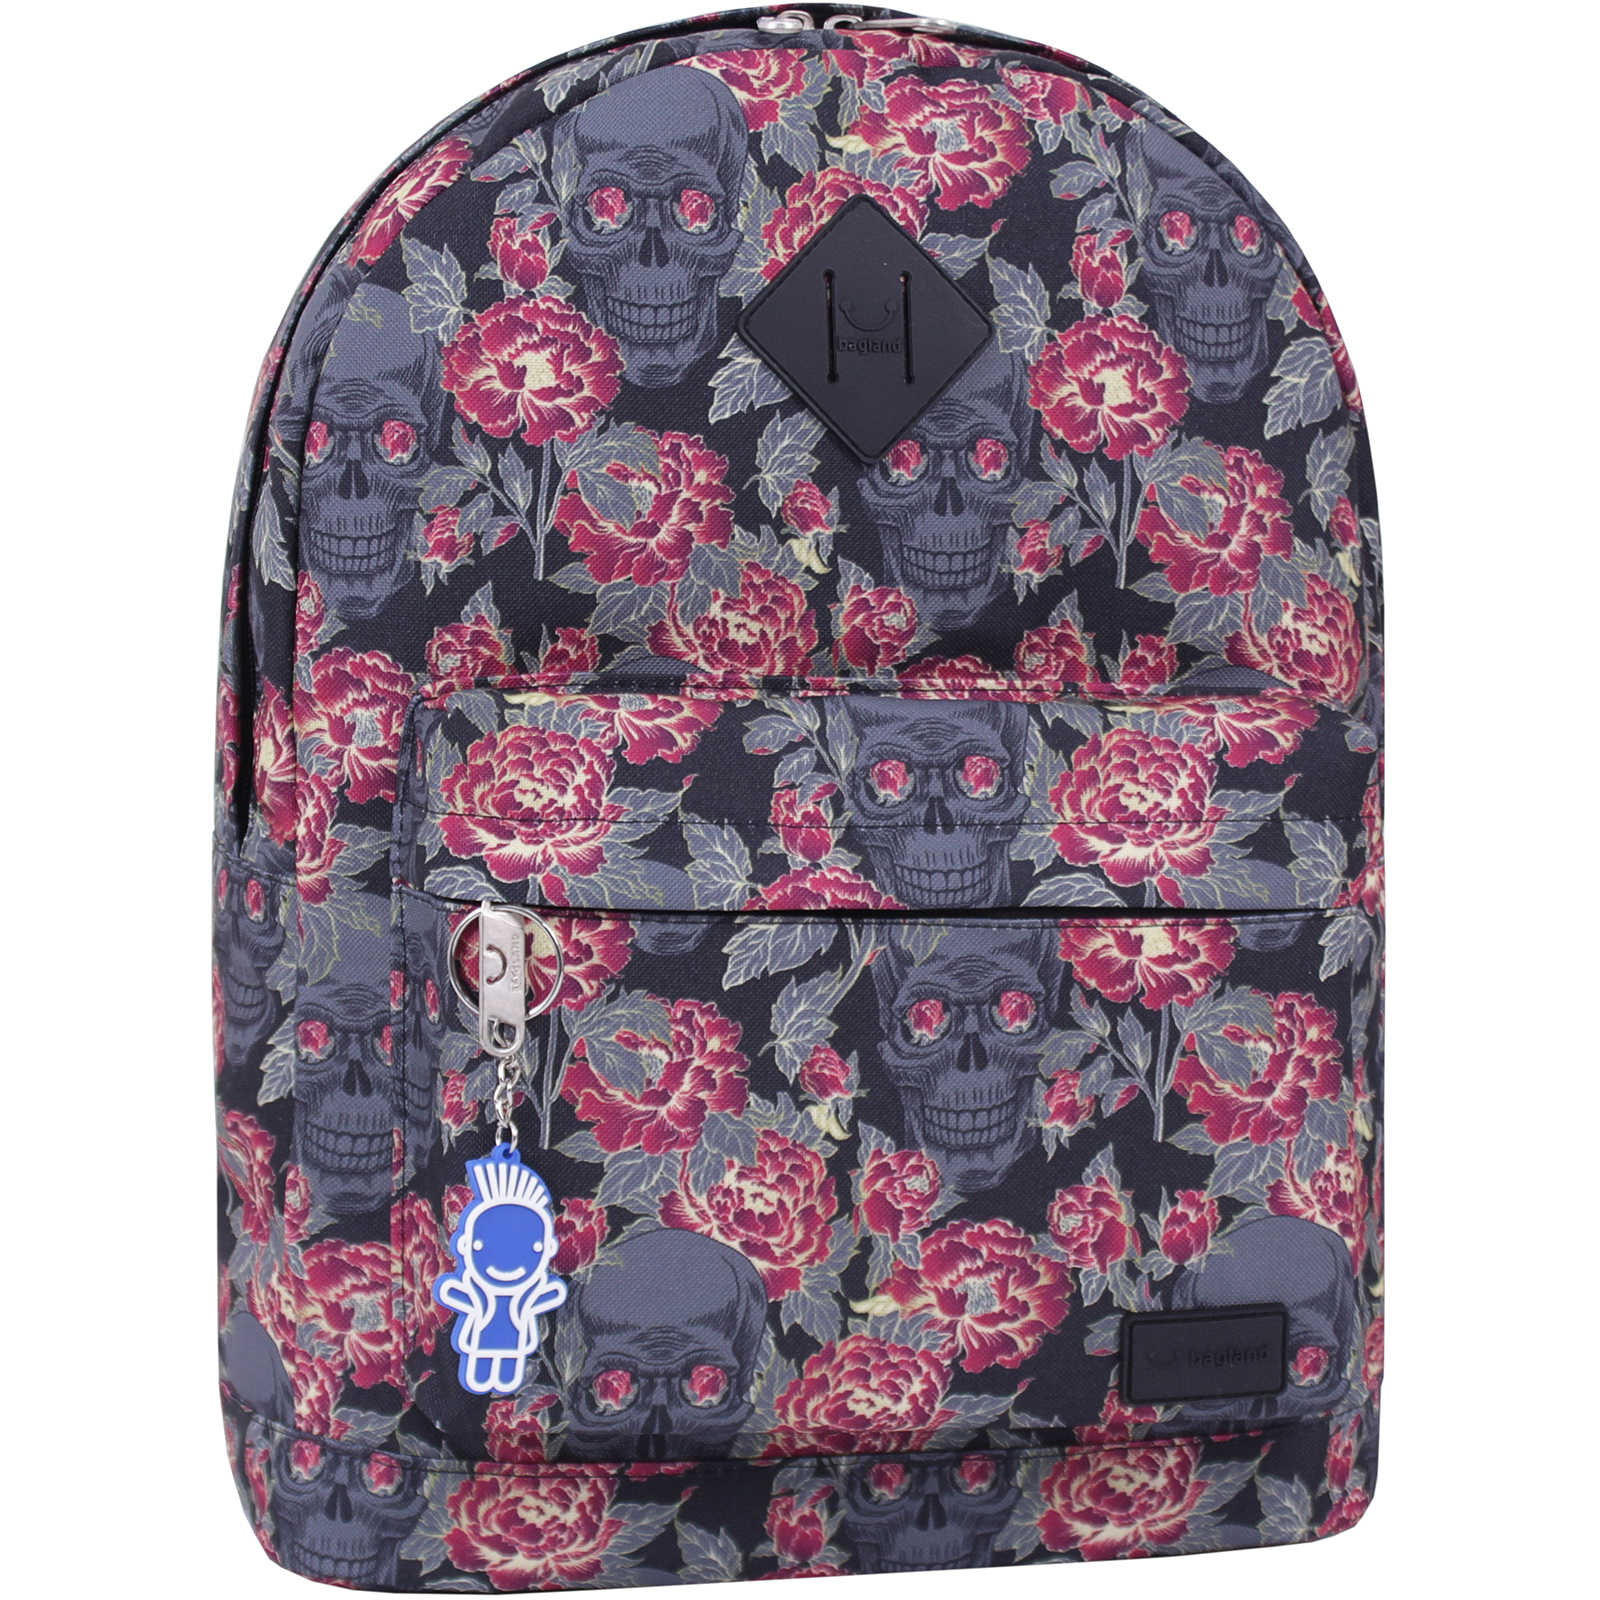 Городские рюкзаки Рюкзак Bagland Молодежный 17 л. сублимация 468 (00533664) IMG_9462_суб.468_.JPG